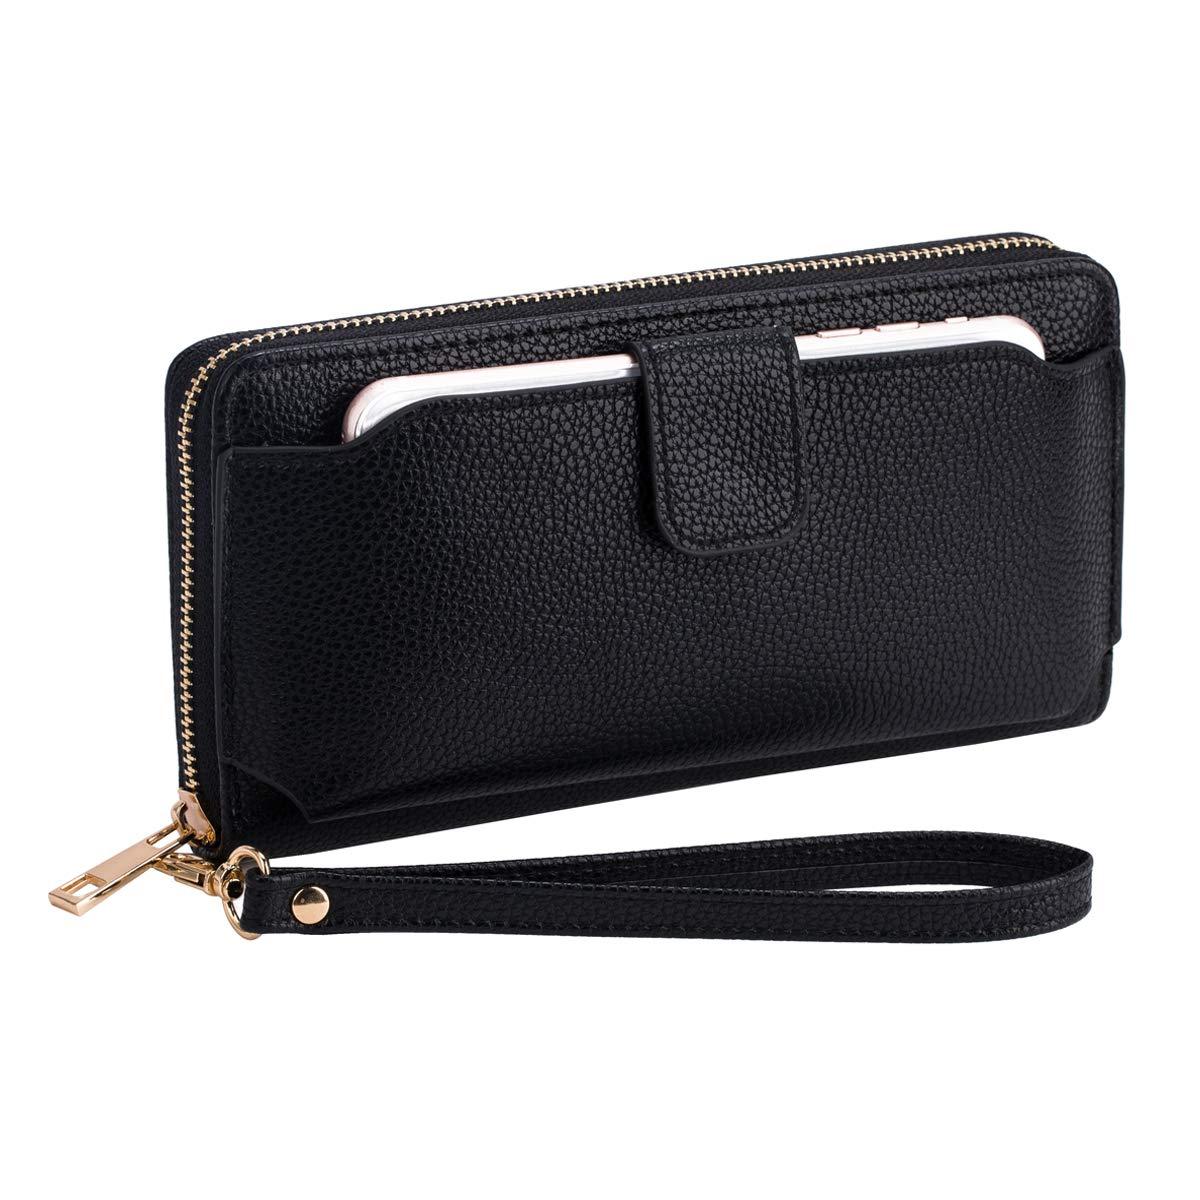 Wristlet Wallet Purses Women Cellphone Pocket Clutch